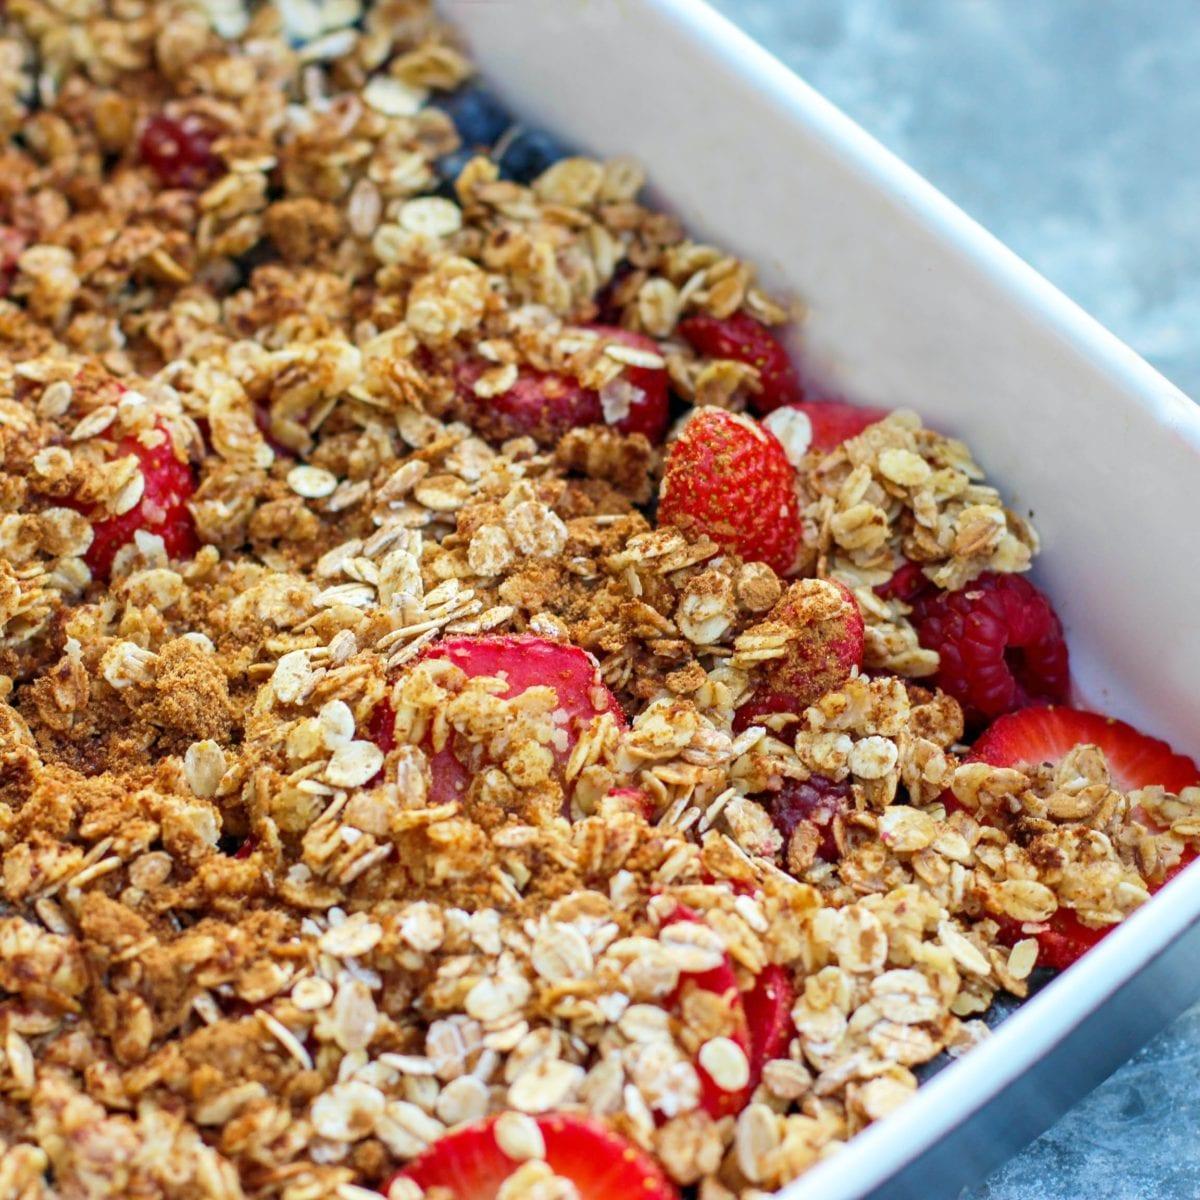 Healthy breakfast choice